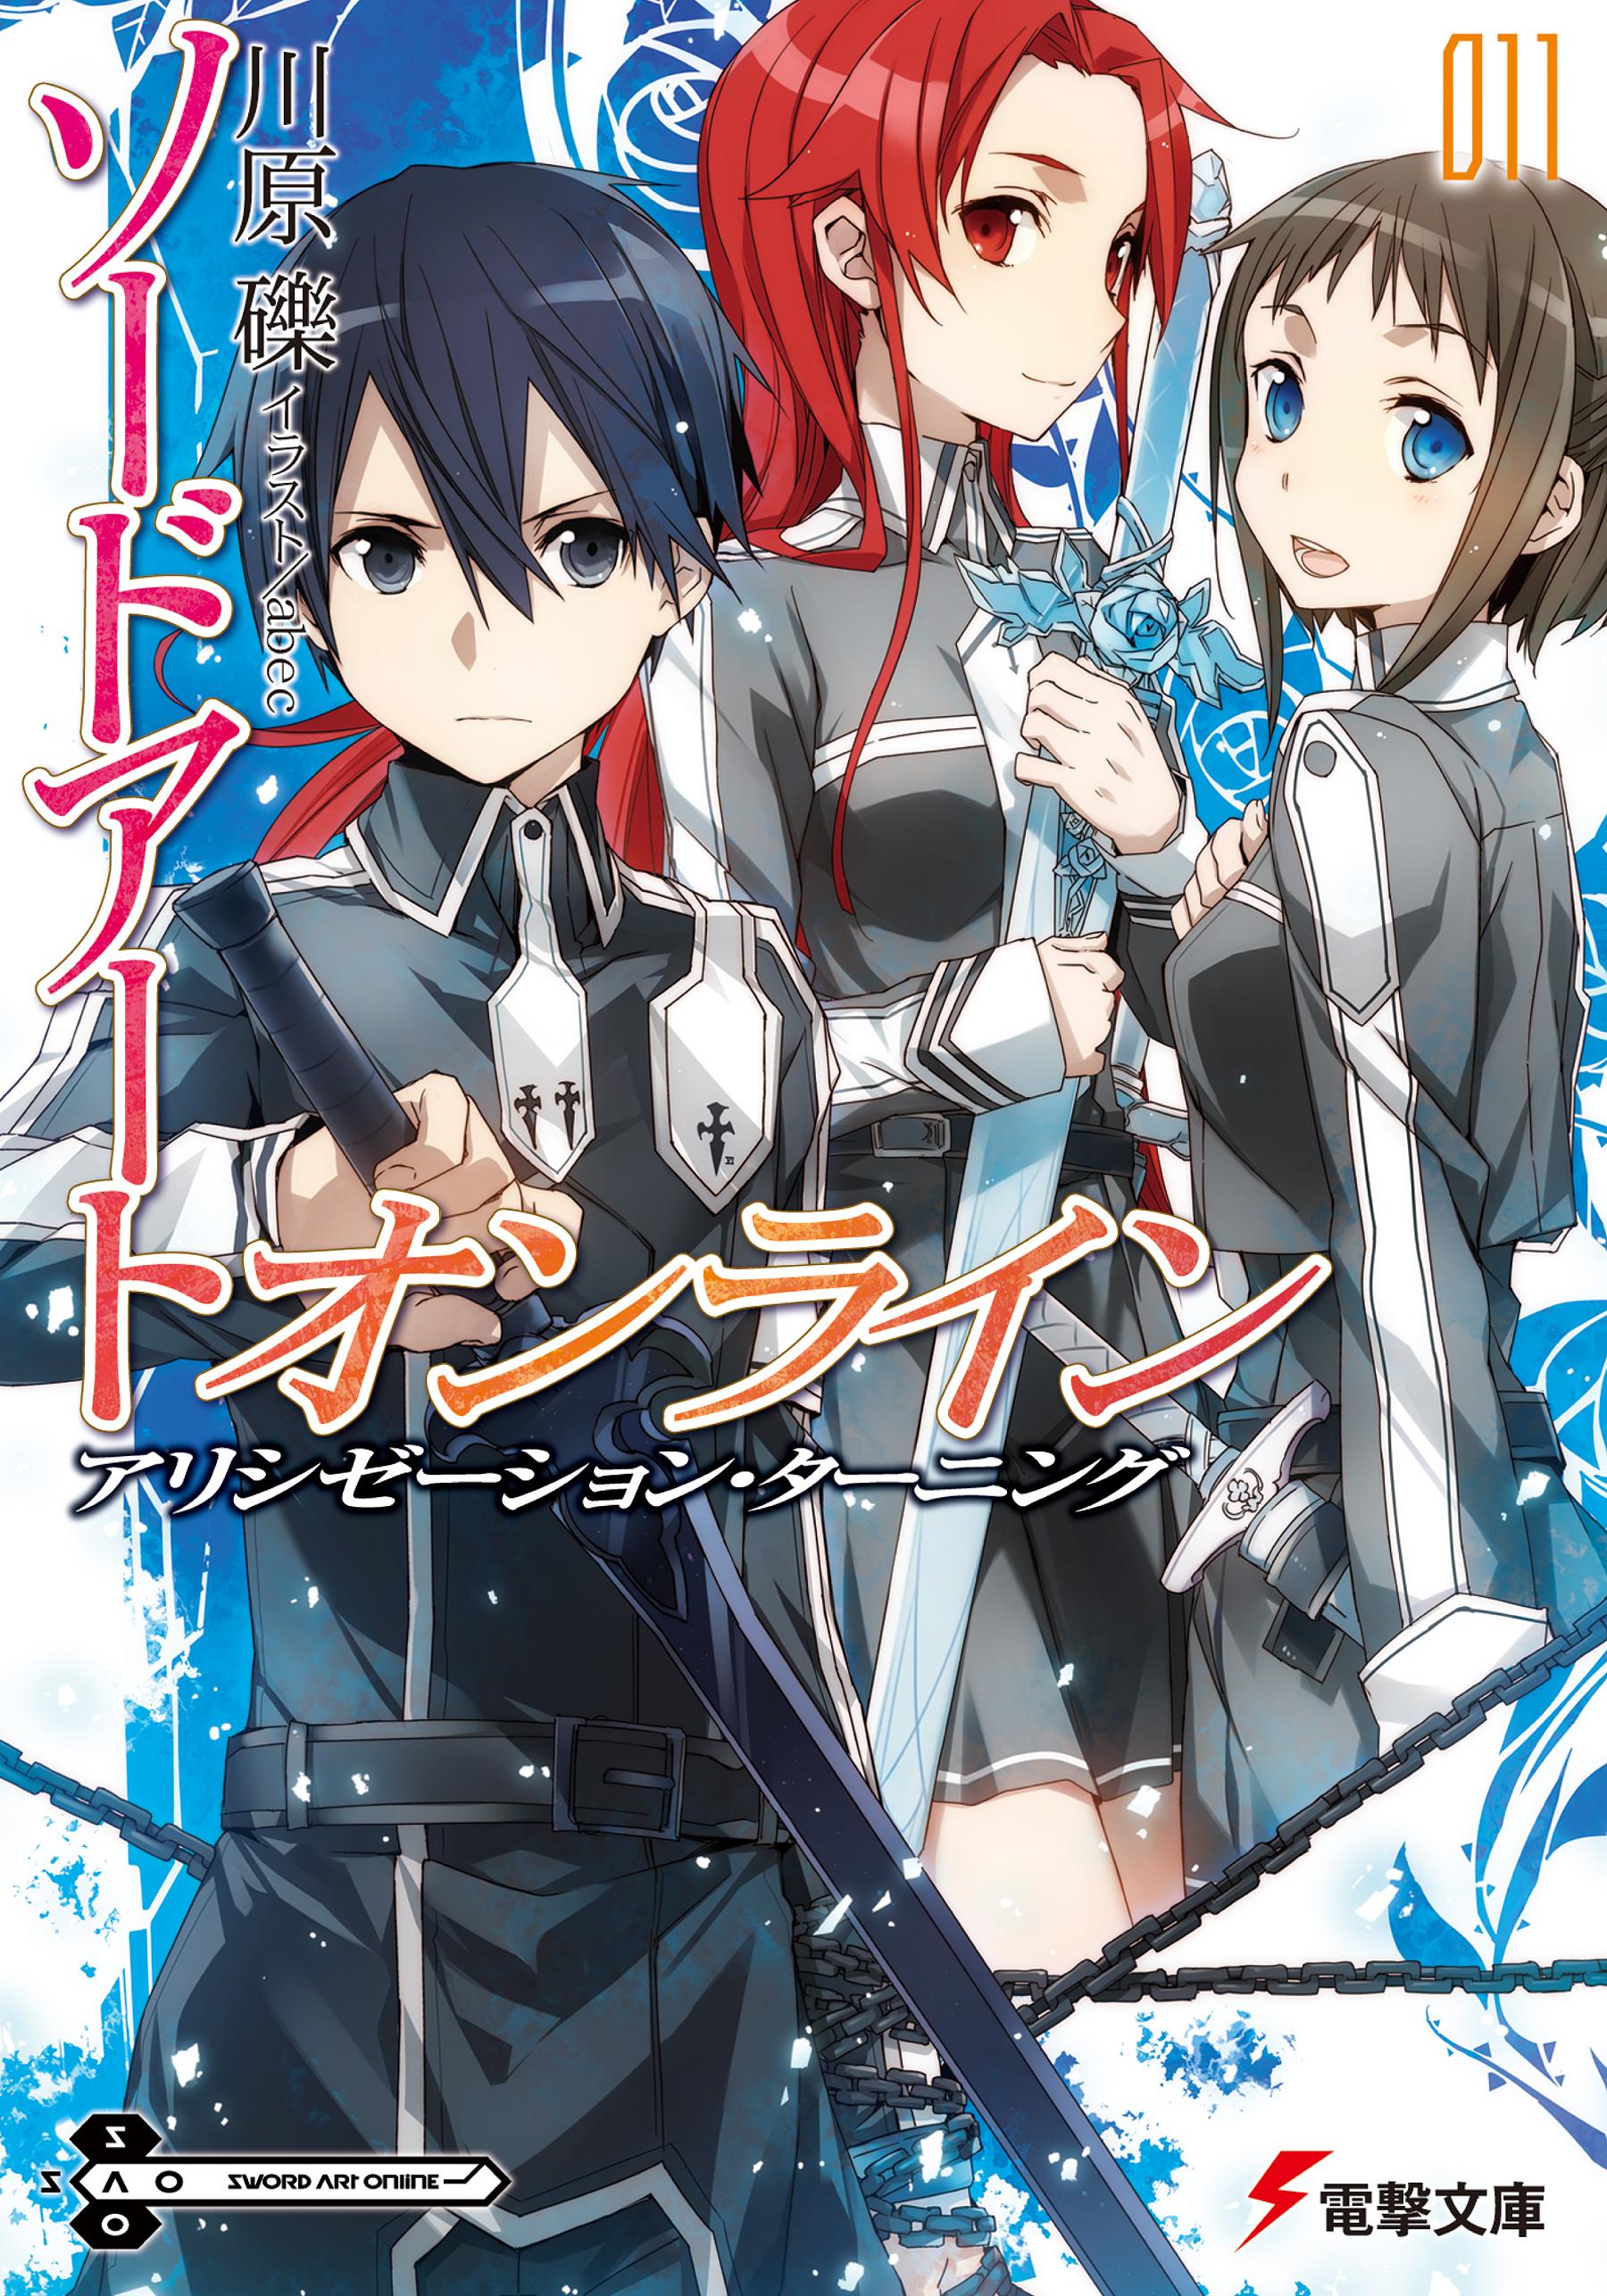 Sword Art Online Volume 11 English Pdf